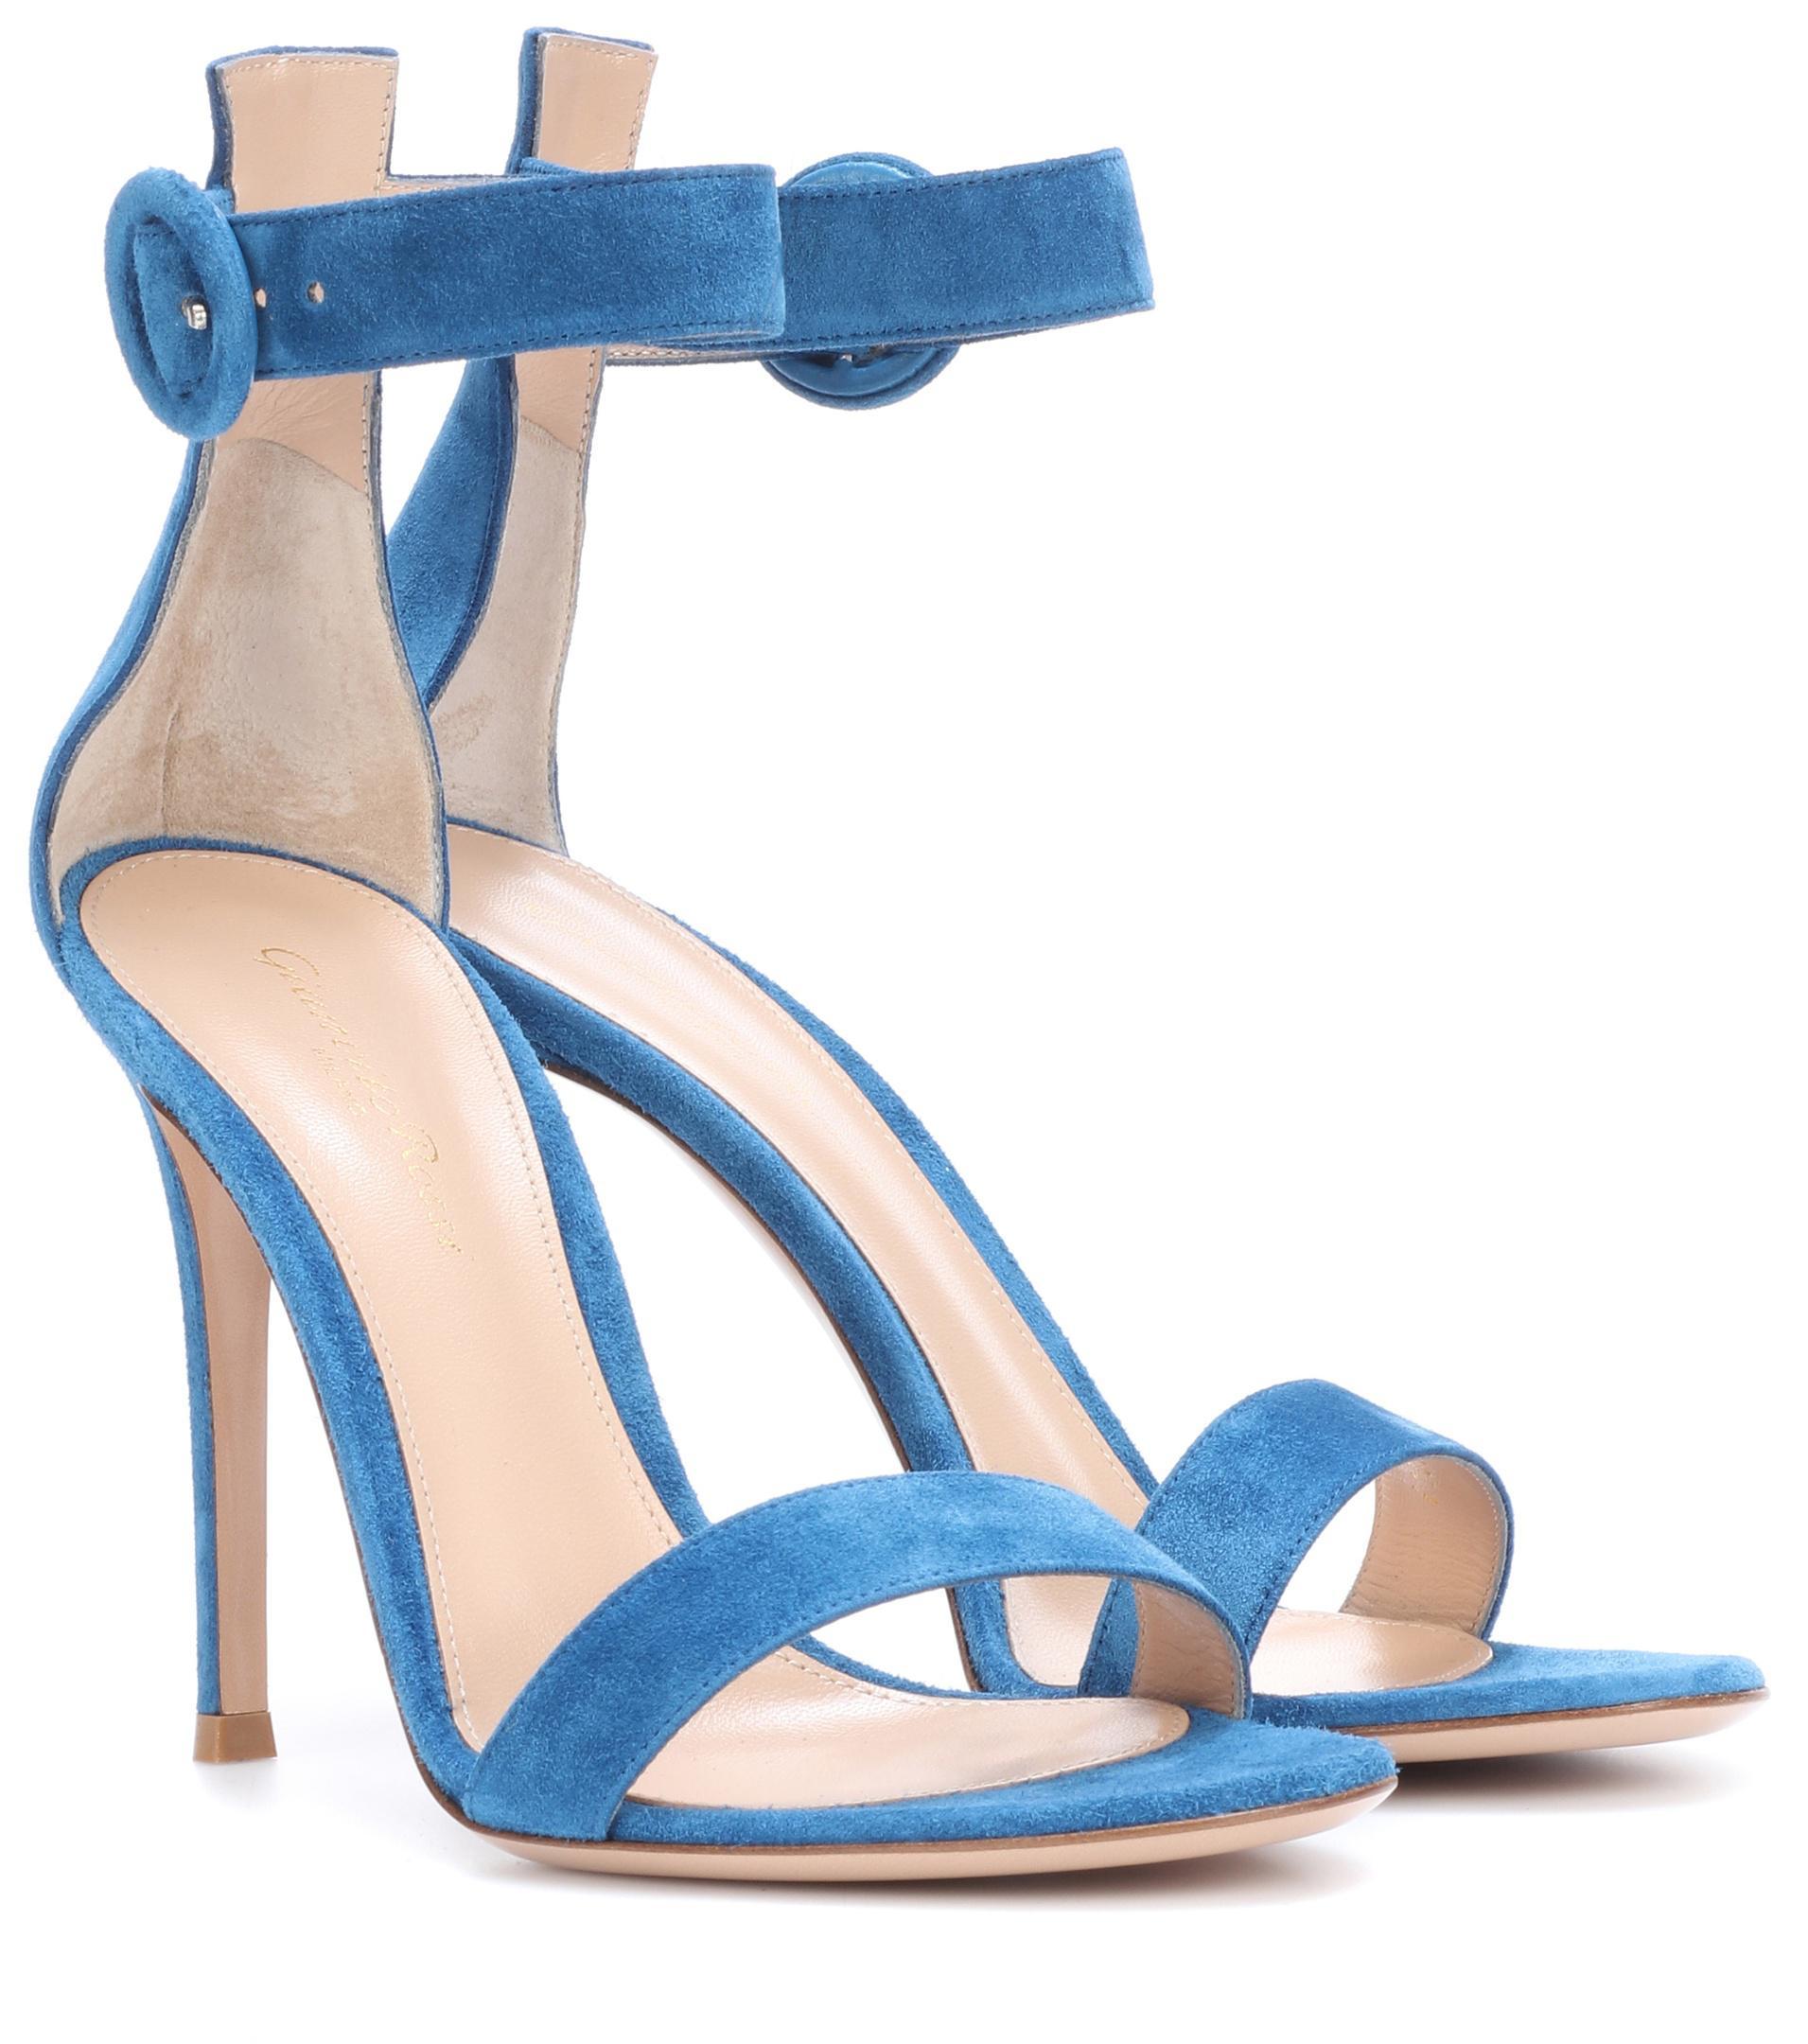 Portofino Shoes Prices